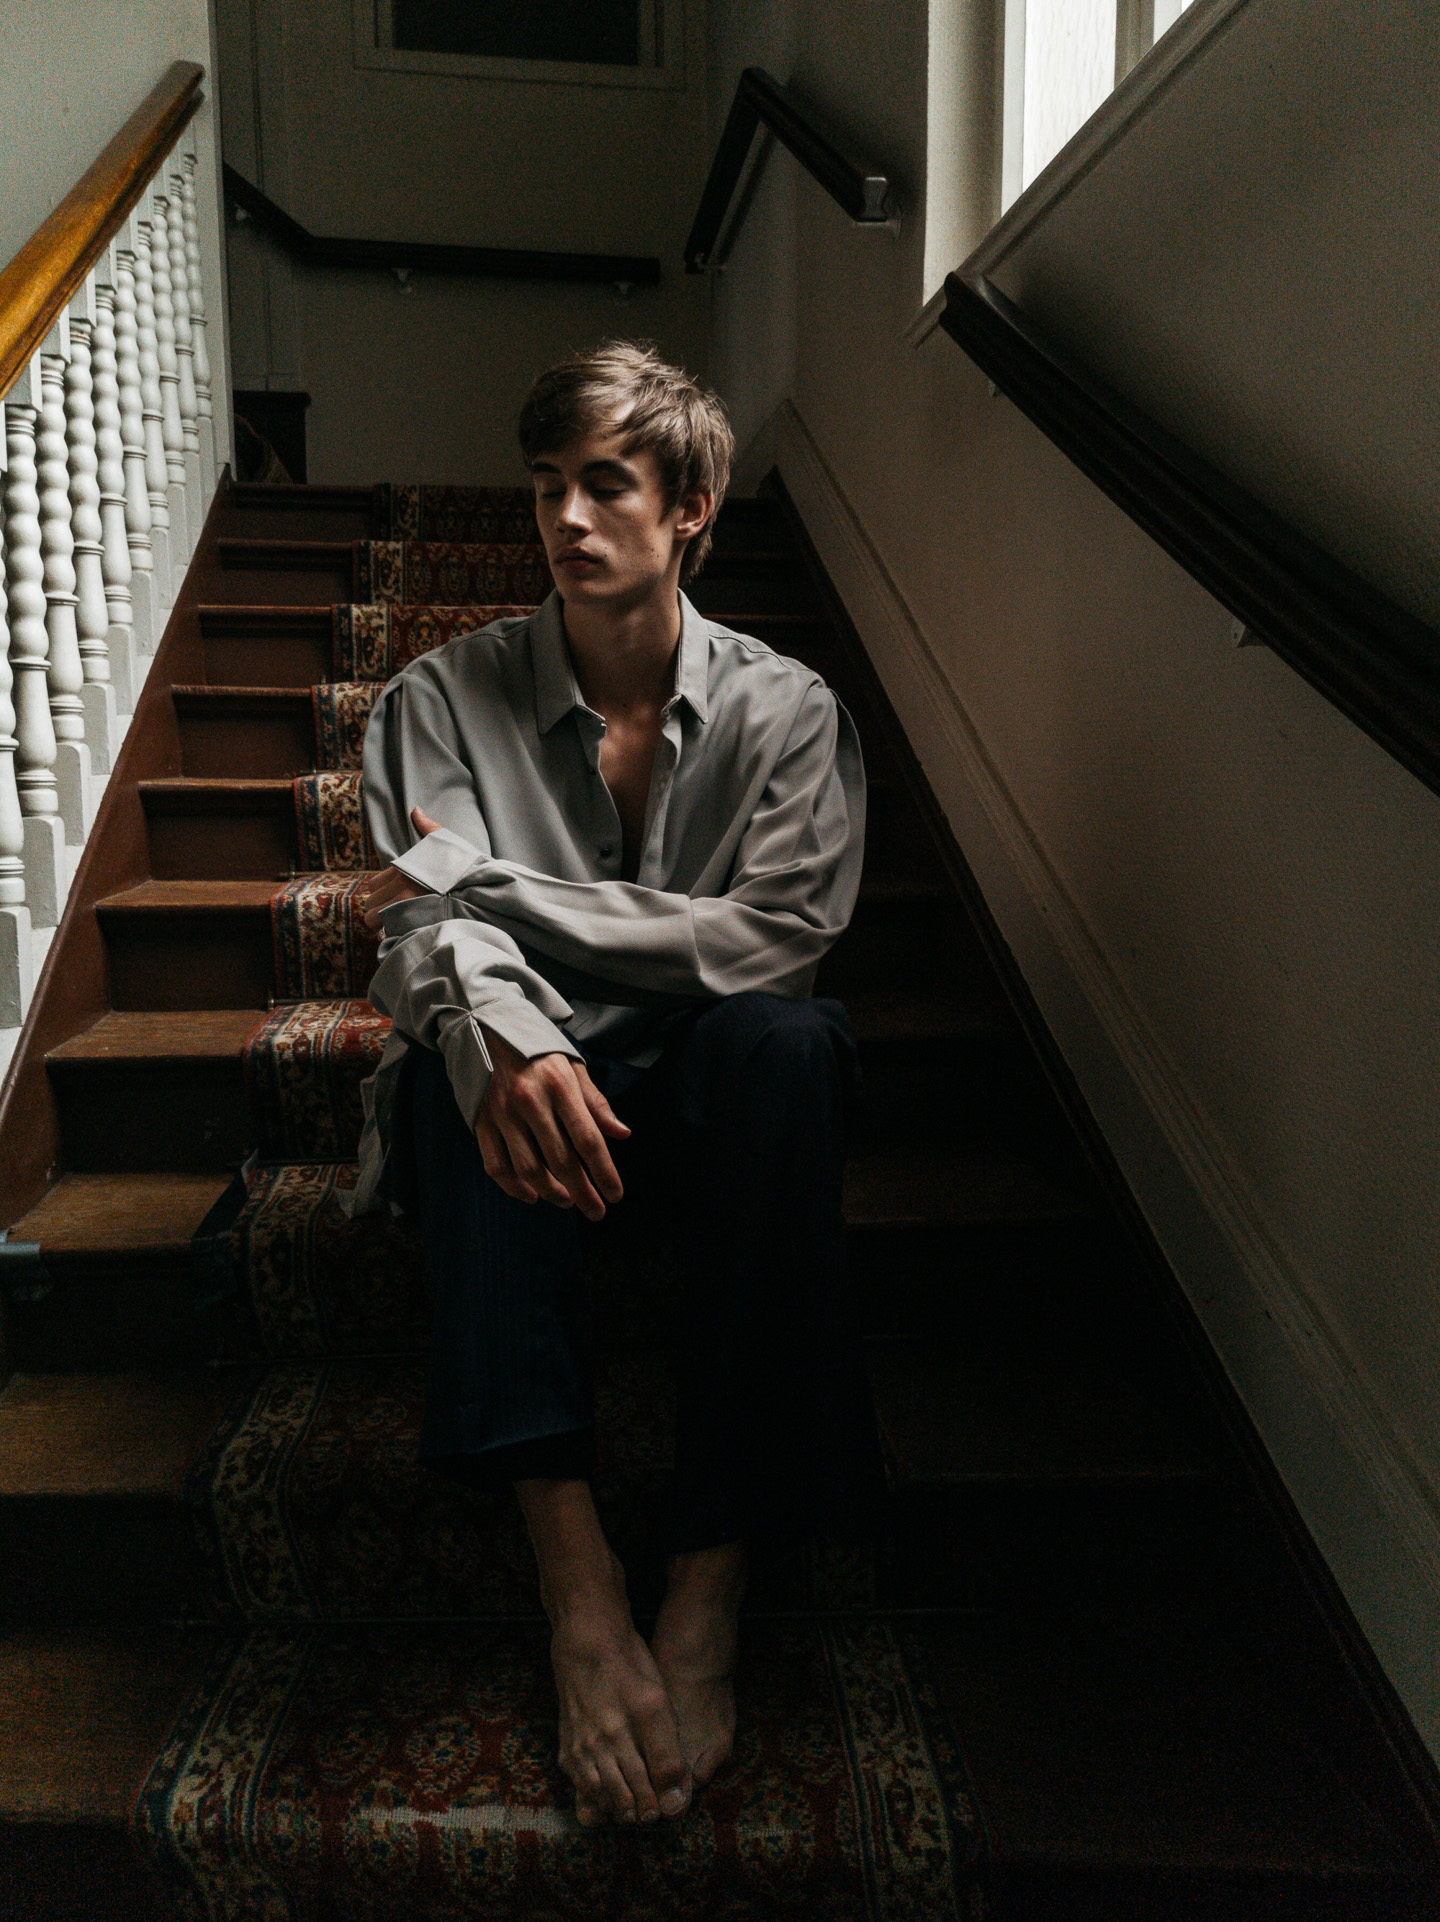 frank-lin-vogue-germany-huawei-fotowettbewerb-julia-sang-nguyen13